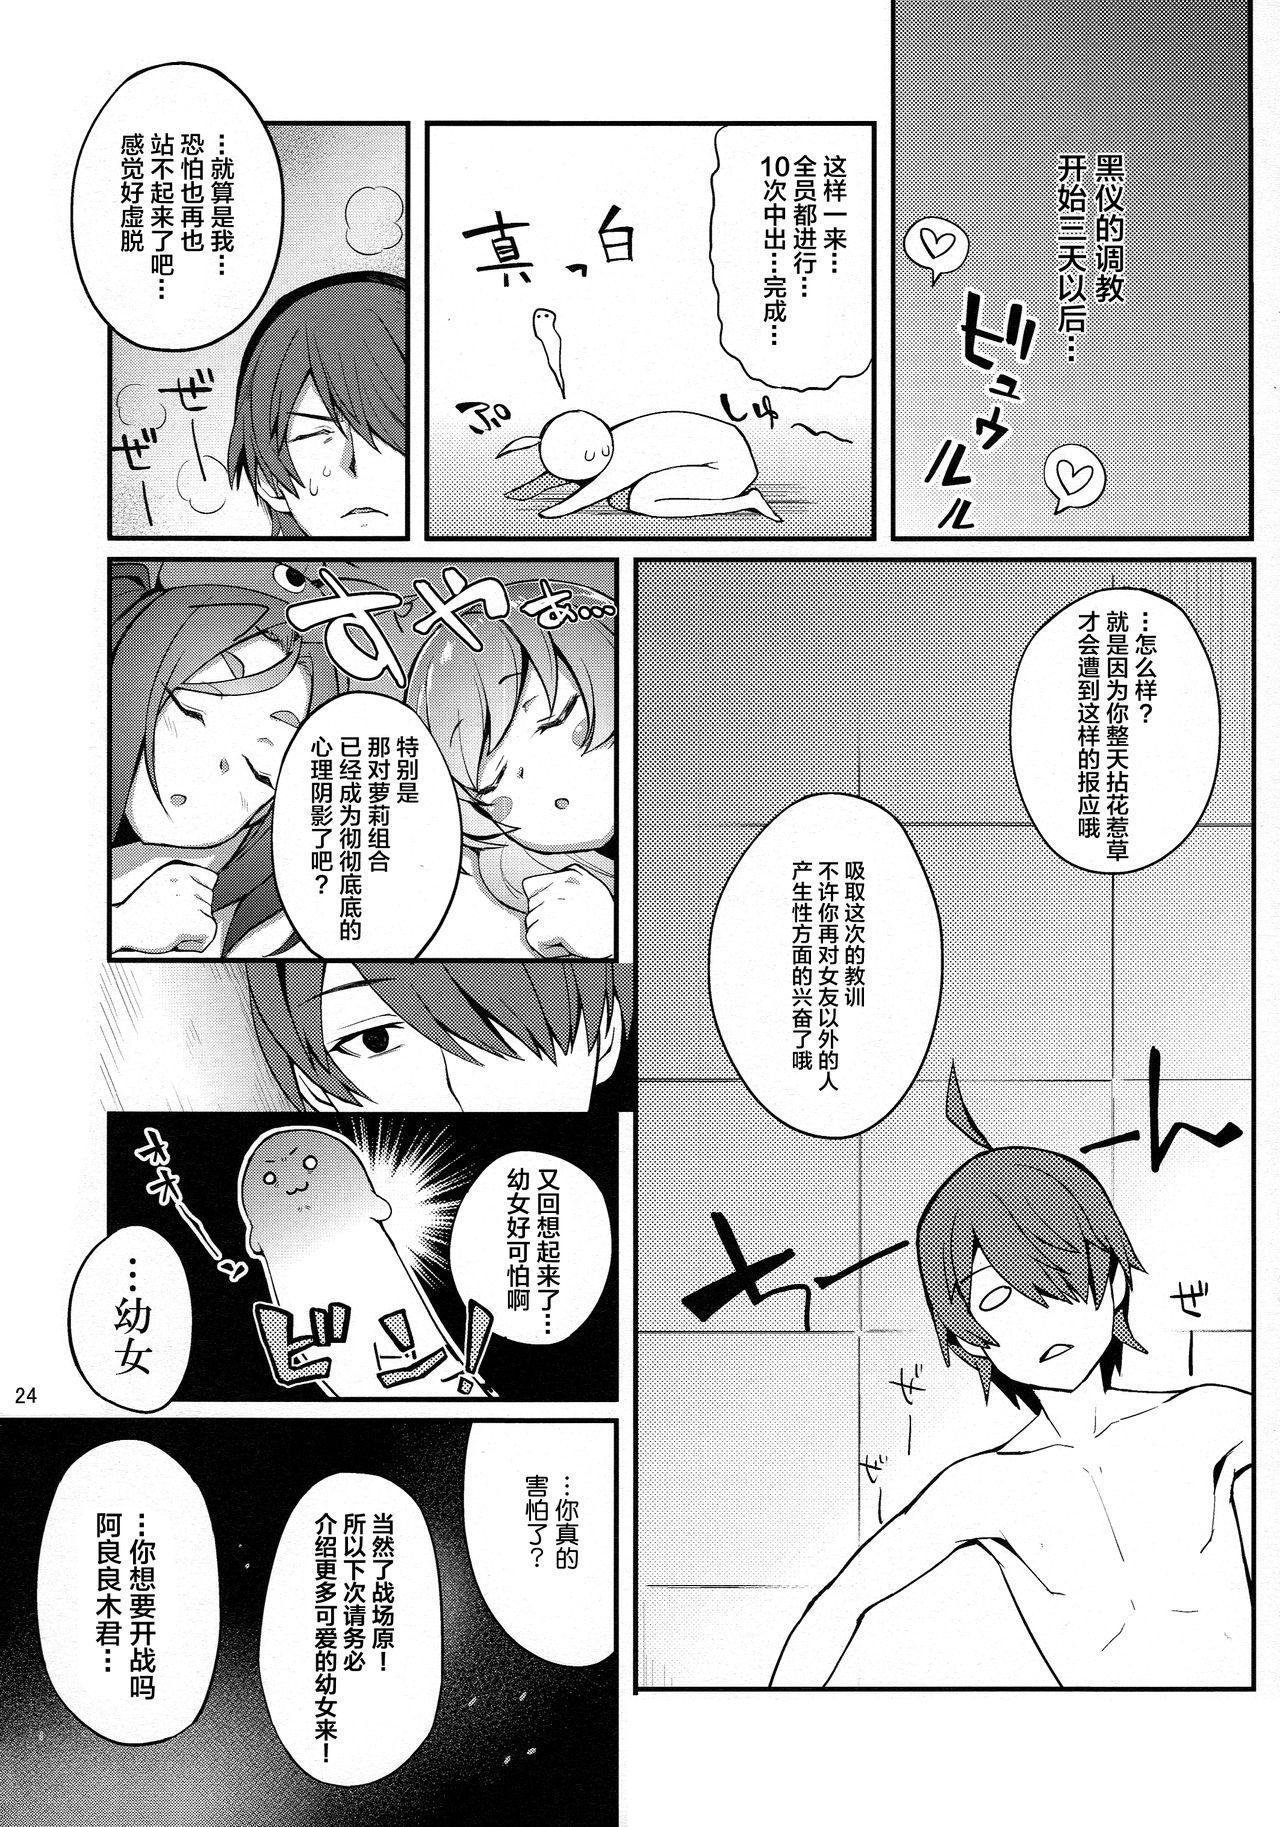 Pachimonogatari Part 12: Koyomi Reform 24